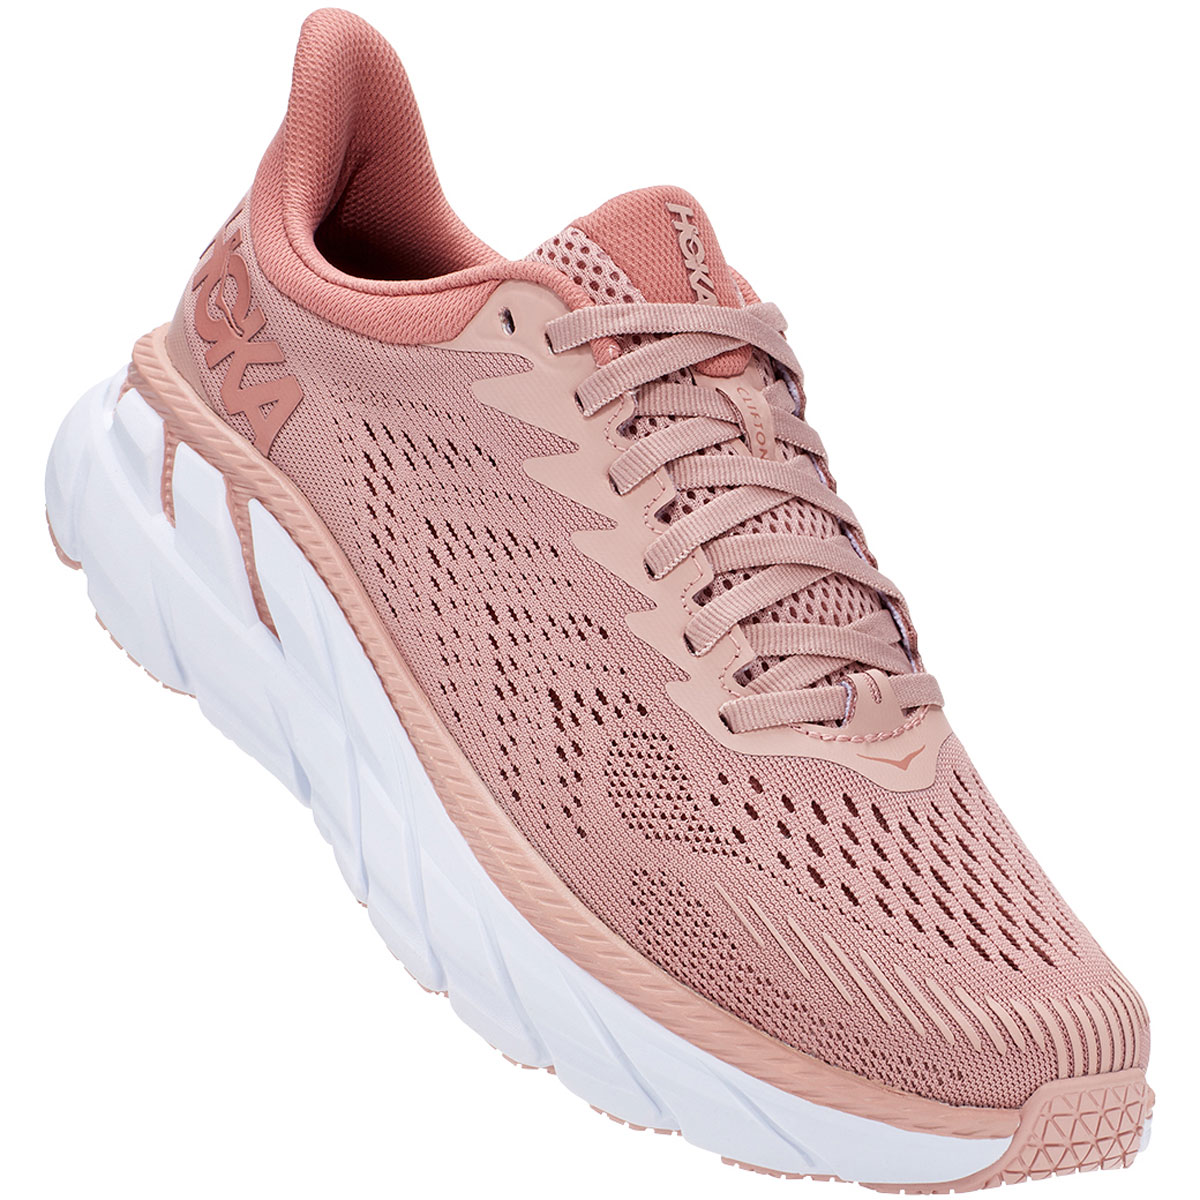 Women's Hoka One One Clifton 7 Running Shoe - Color: Misty Rose - Size: 10 - Width: Regular, Misty Rose, large, image 4